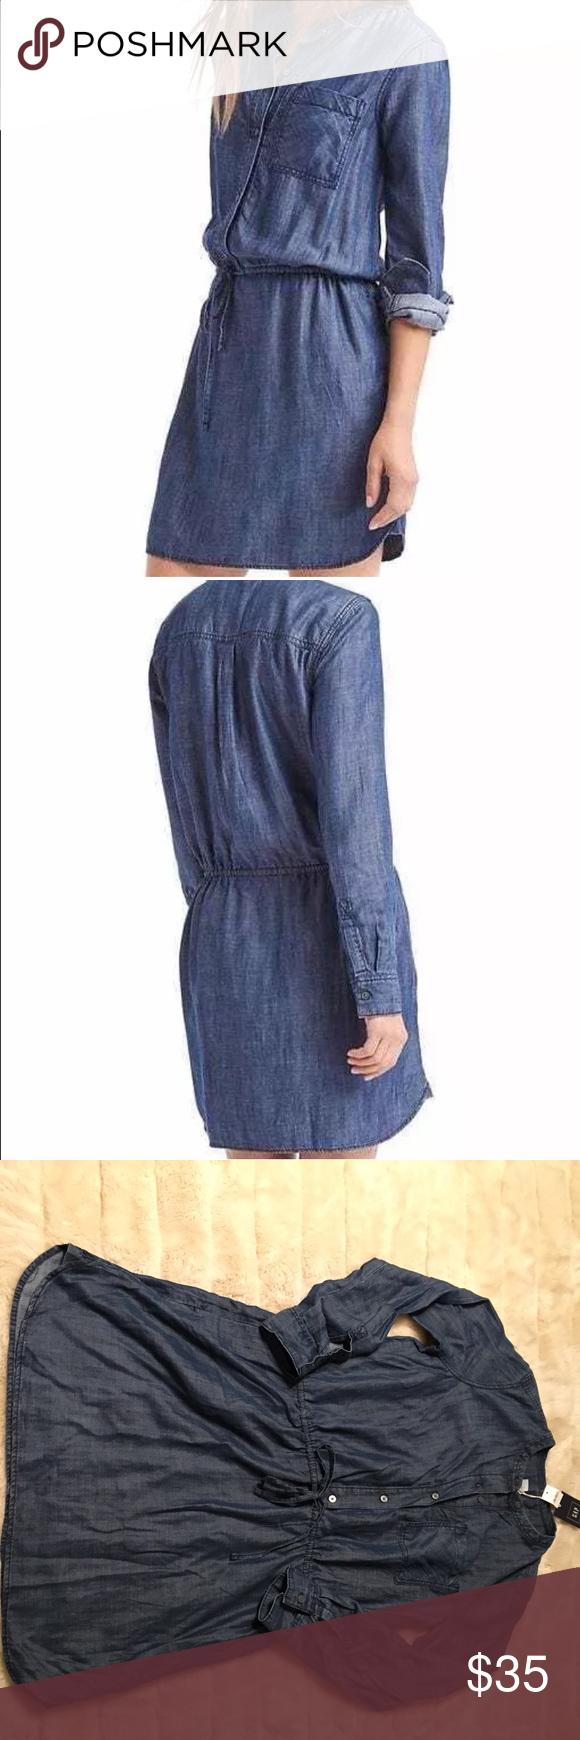 Nwt gap sz large long sleeve tencel shirt dress nwt chambray and